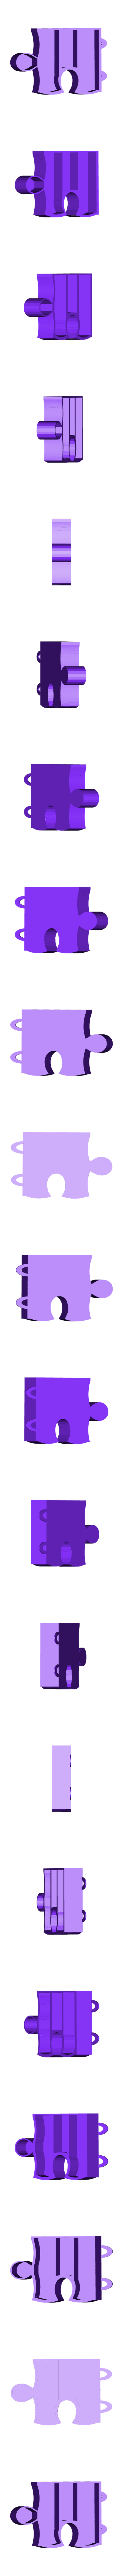 puzzle new 3 accroche.stl Download STL file PUZZLE SHELVES • 3D print model, catf3d